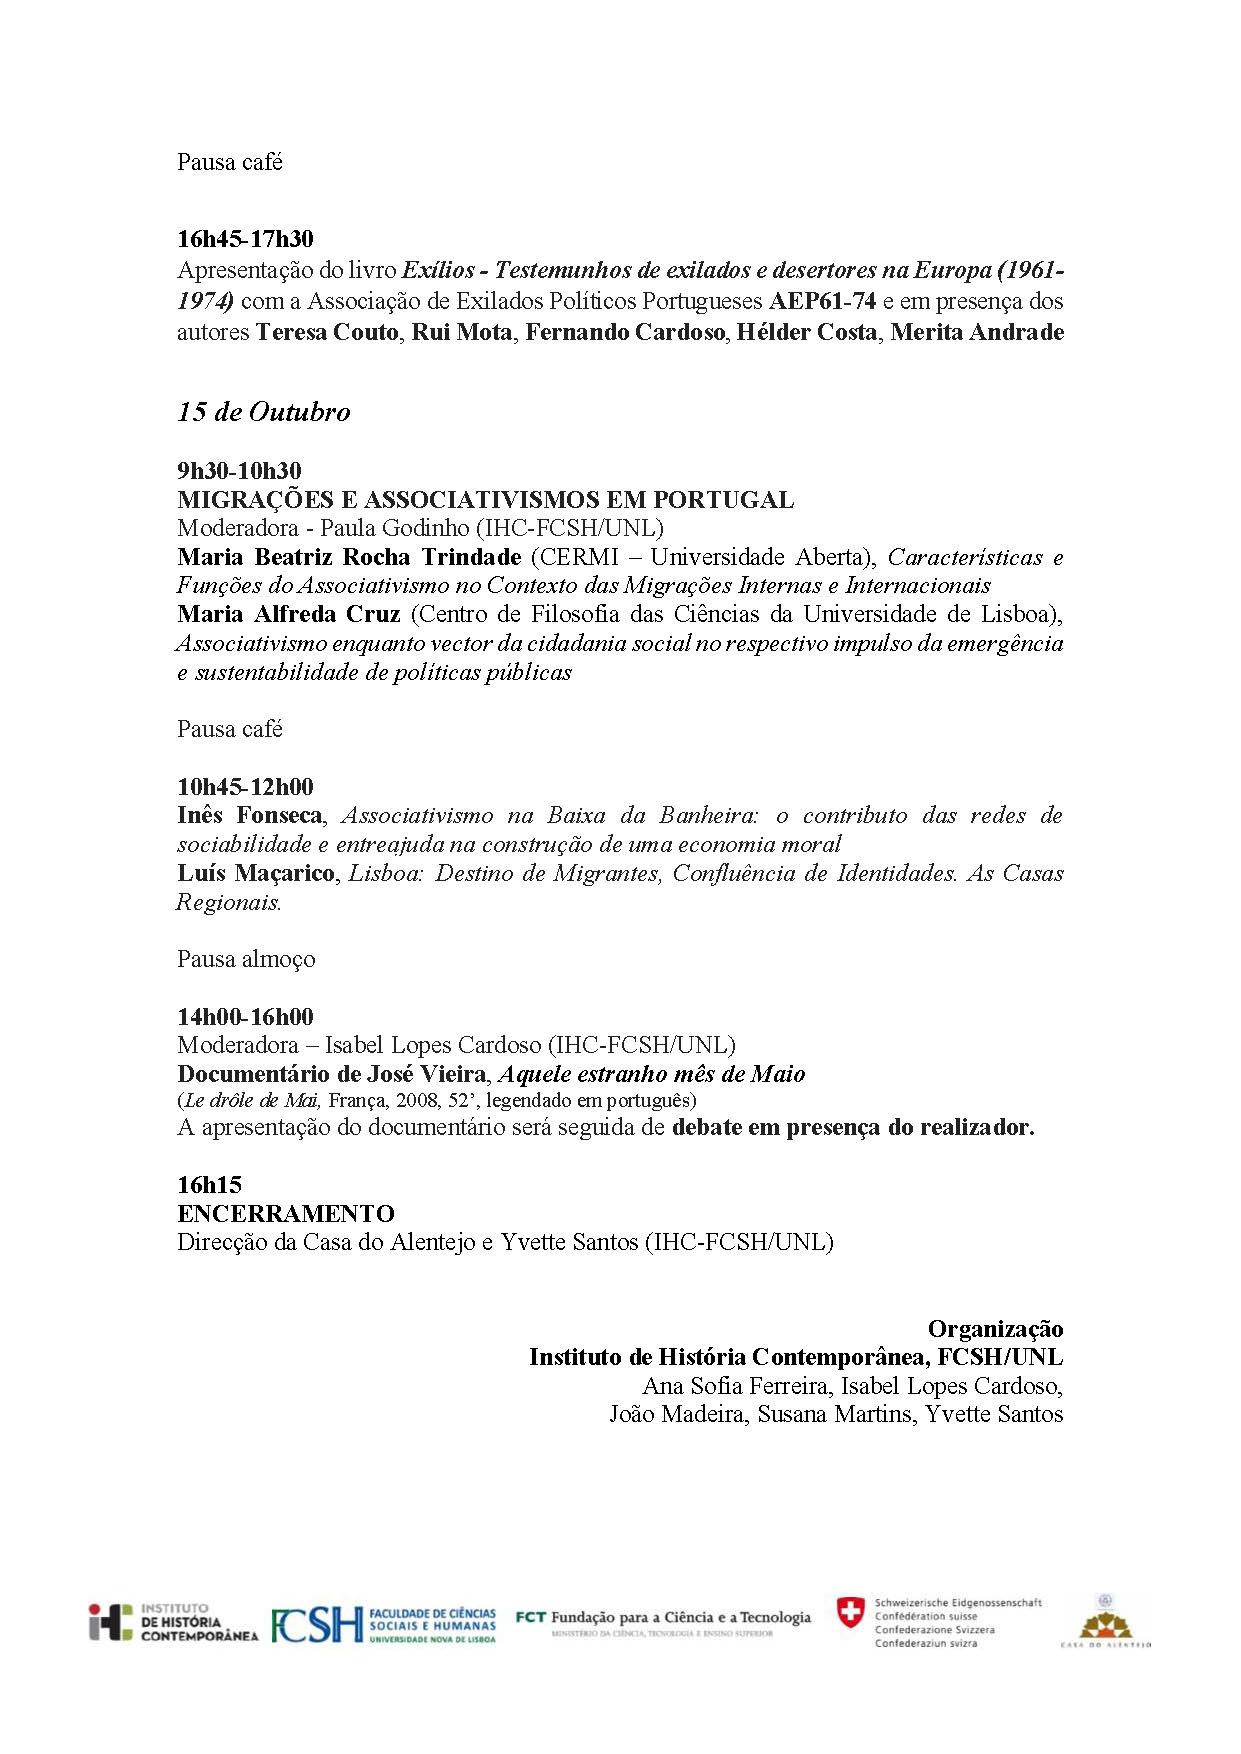 programa-definitivo-exilios-migrac%cc%a7oes-associativismos_page_2